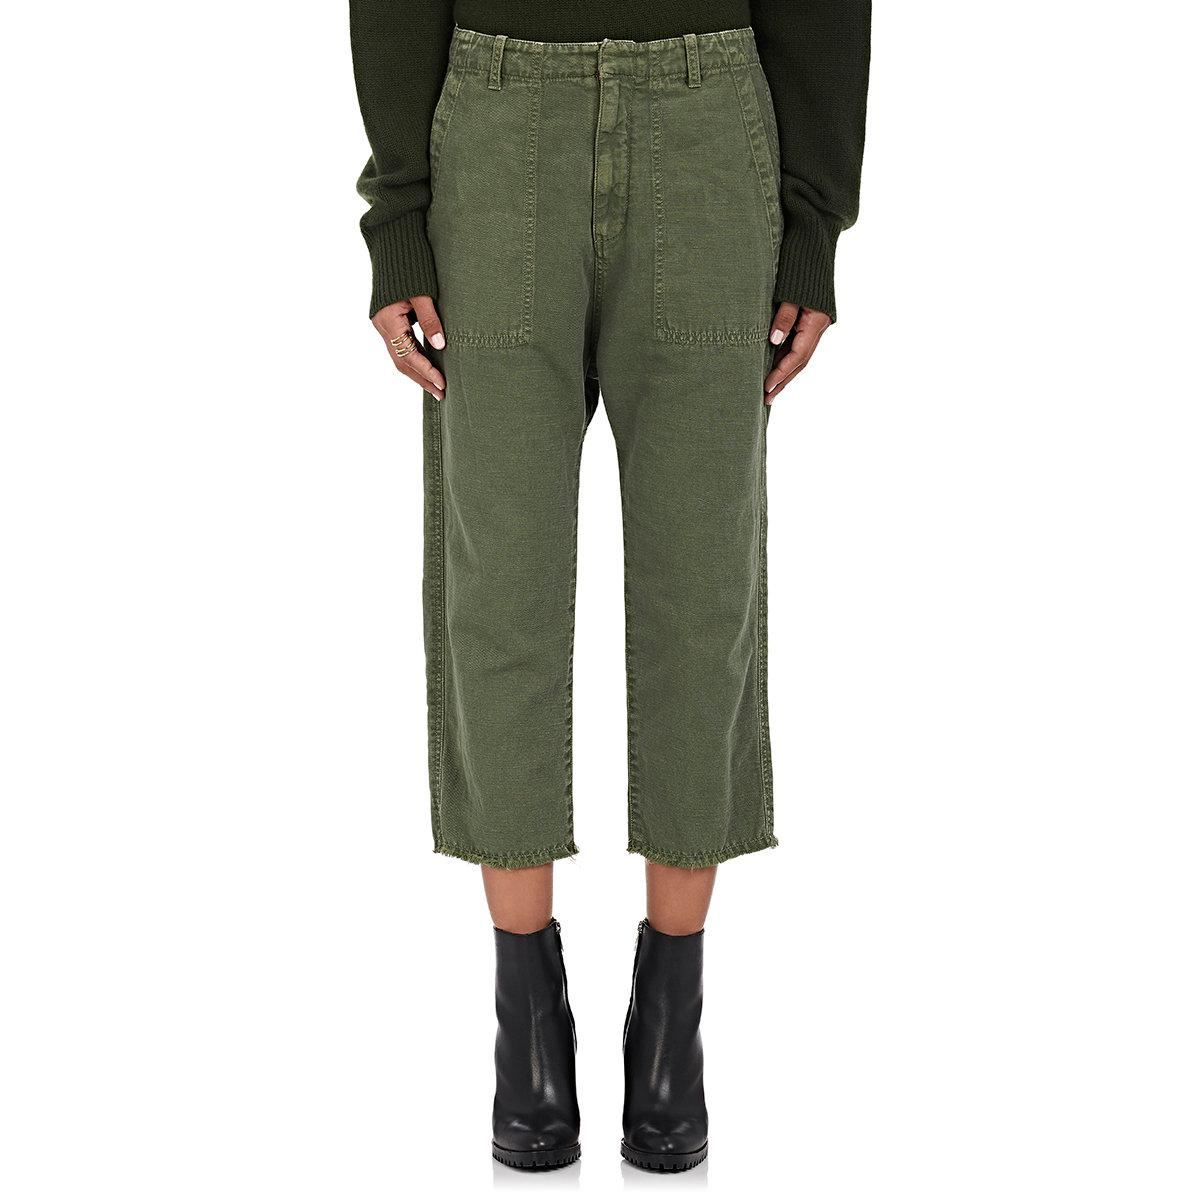 Womens Luna Cotton-Linen Twill Drop-Rise Pants Nili Lotan Cheap Discount Sale avLRkmj2